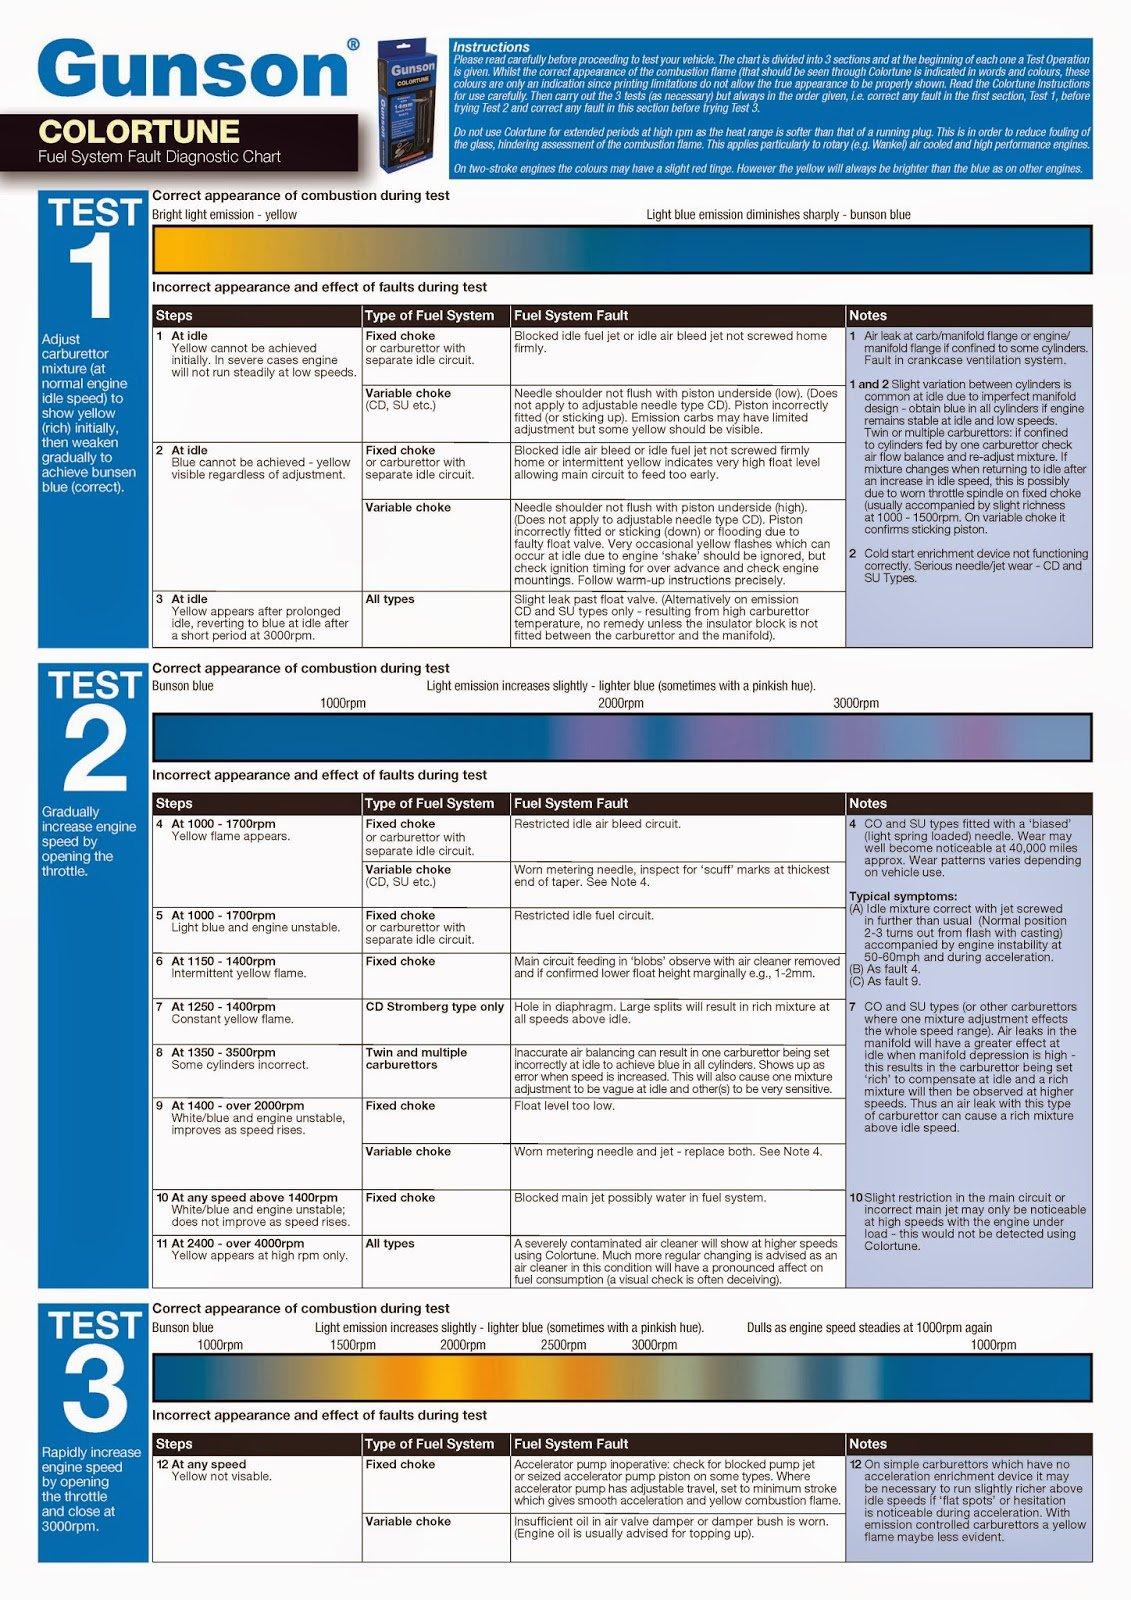 G4074_Chart-colortune-instructions.jpg